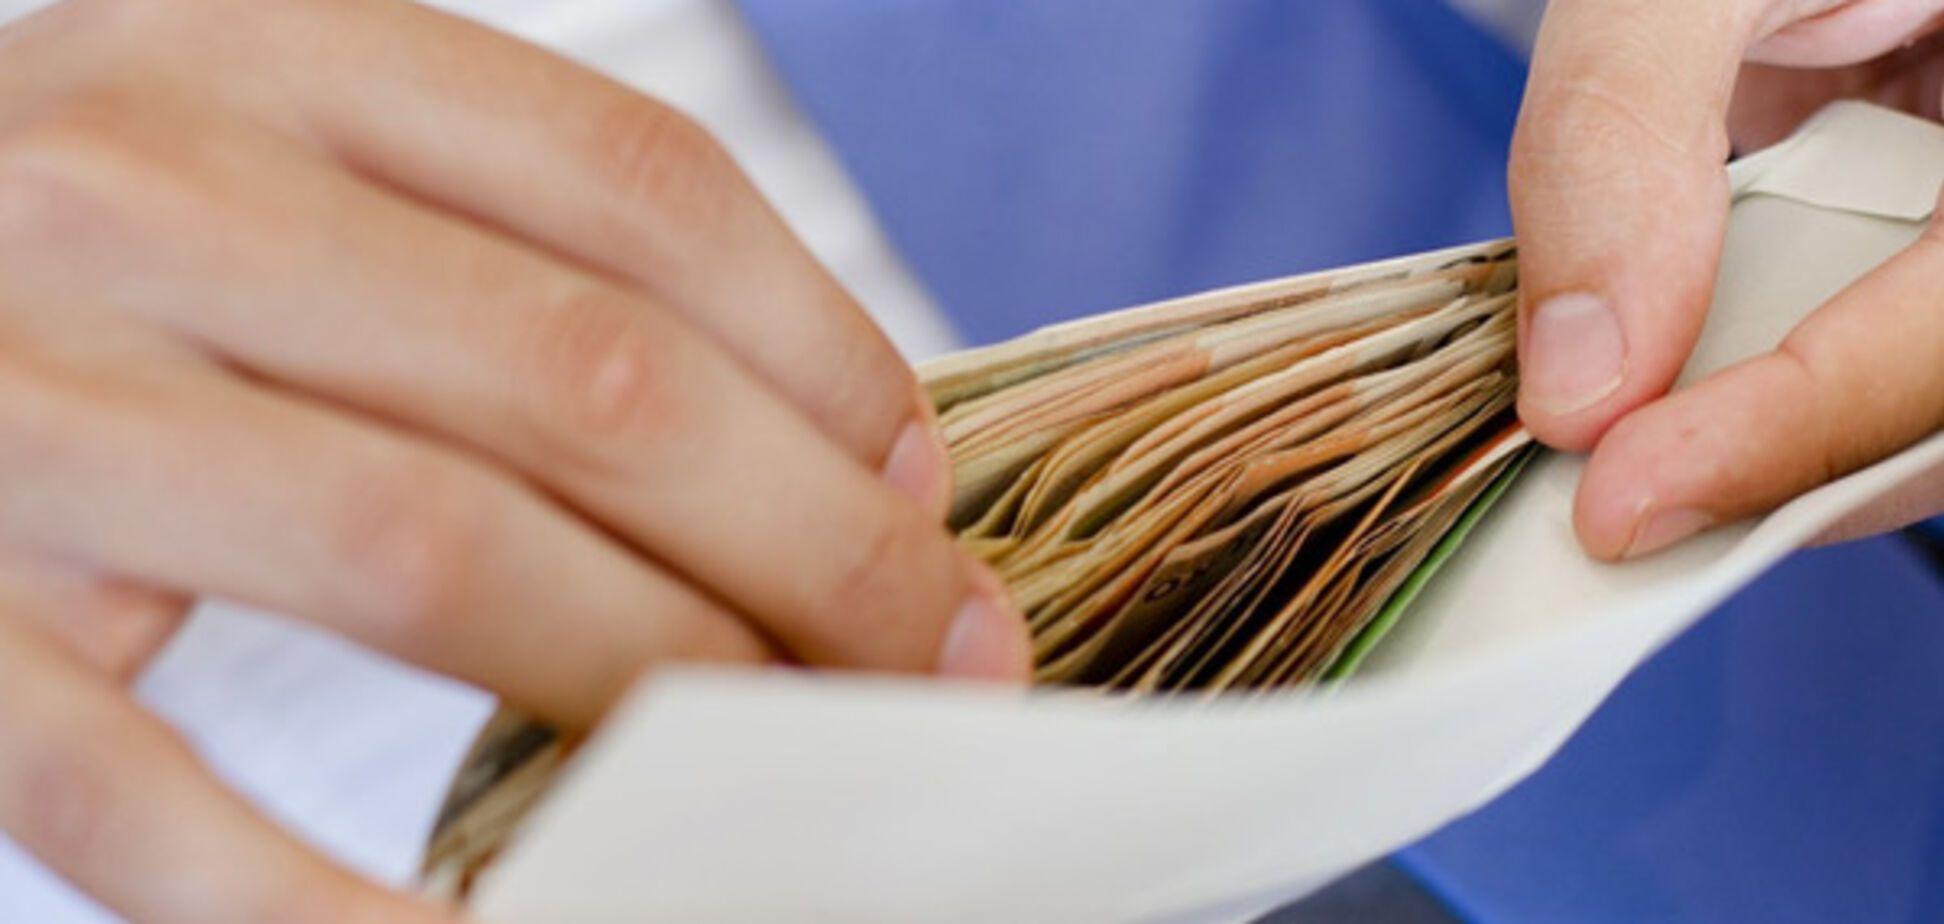 Зарплата по-белому или в конверте: опрос